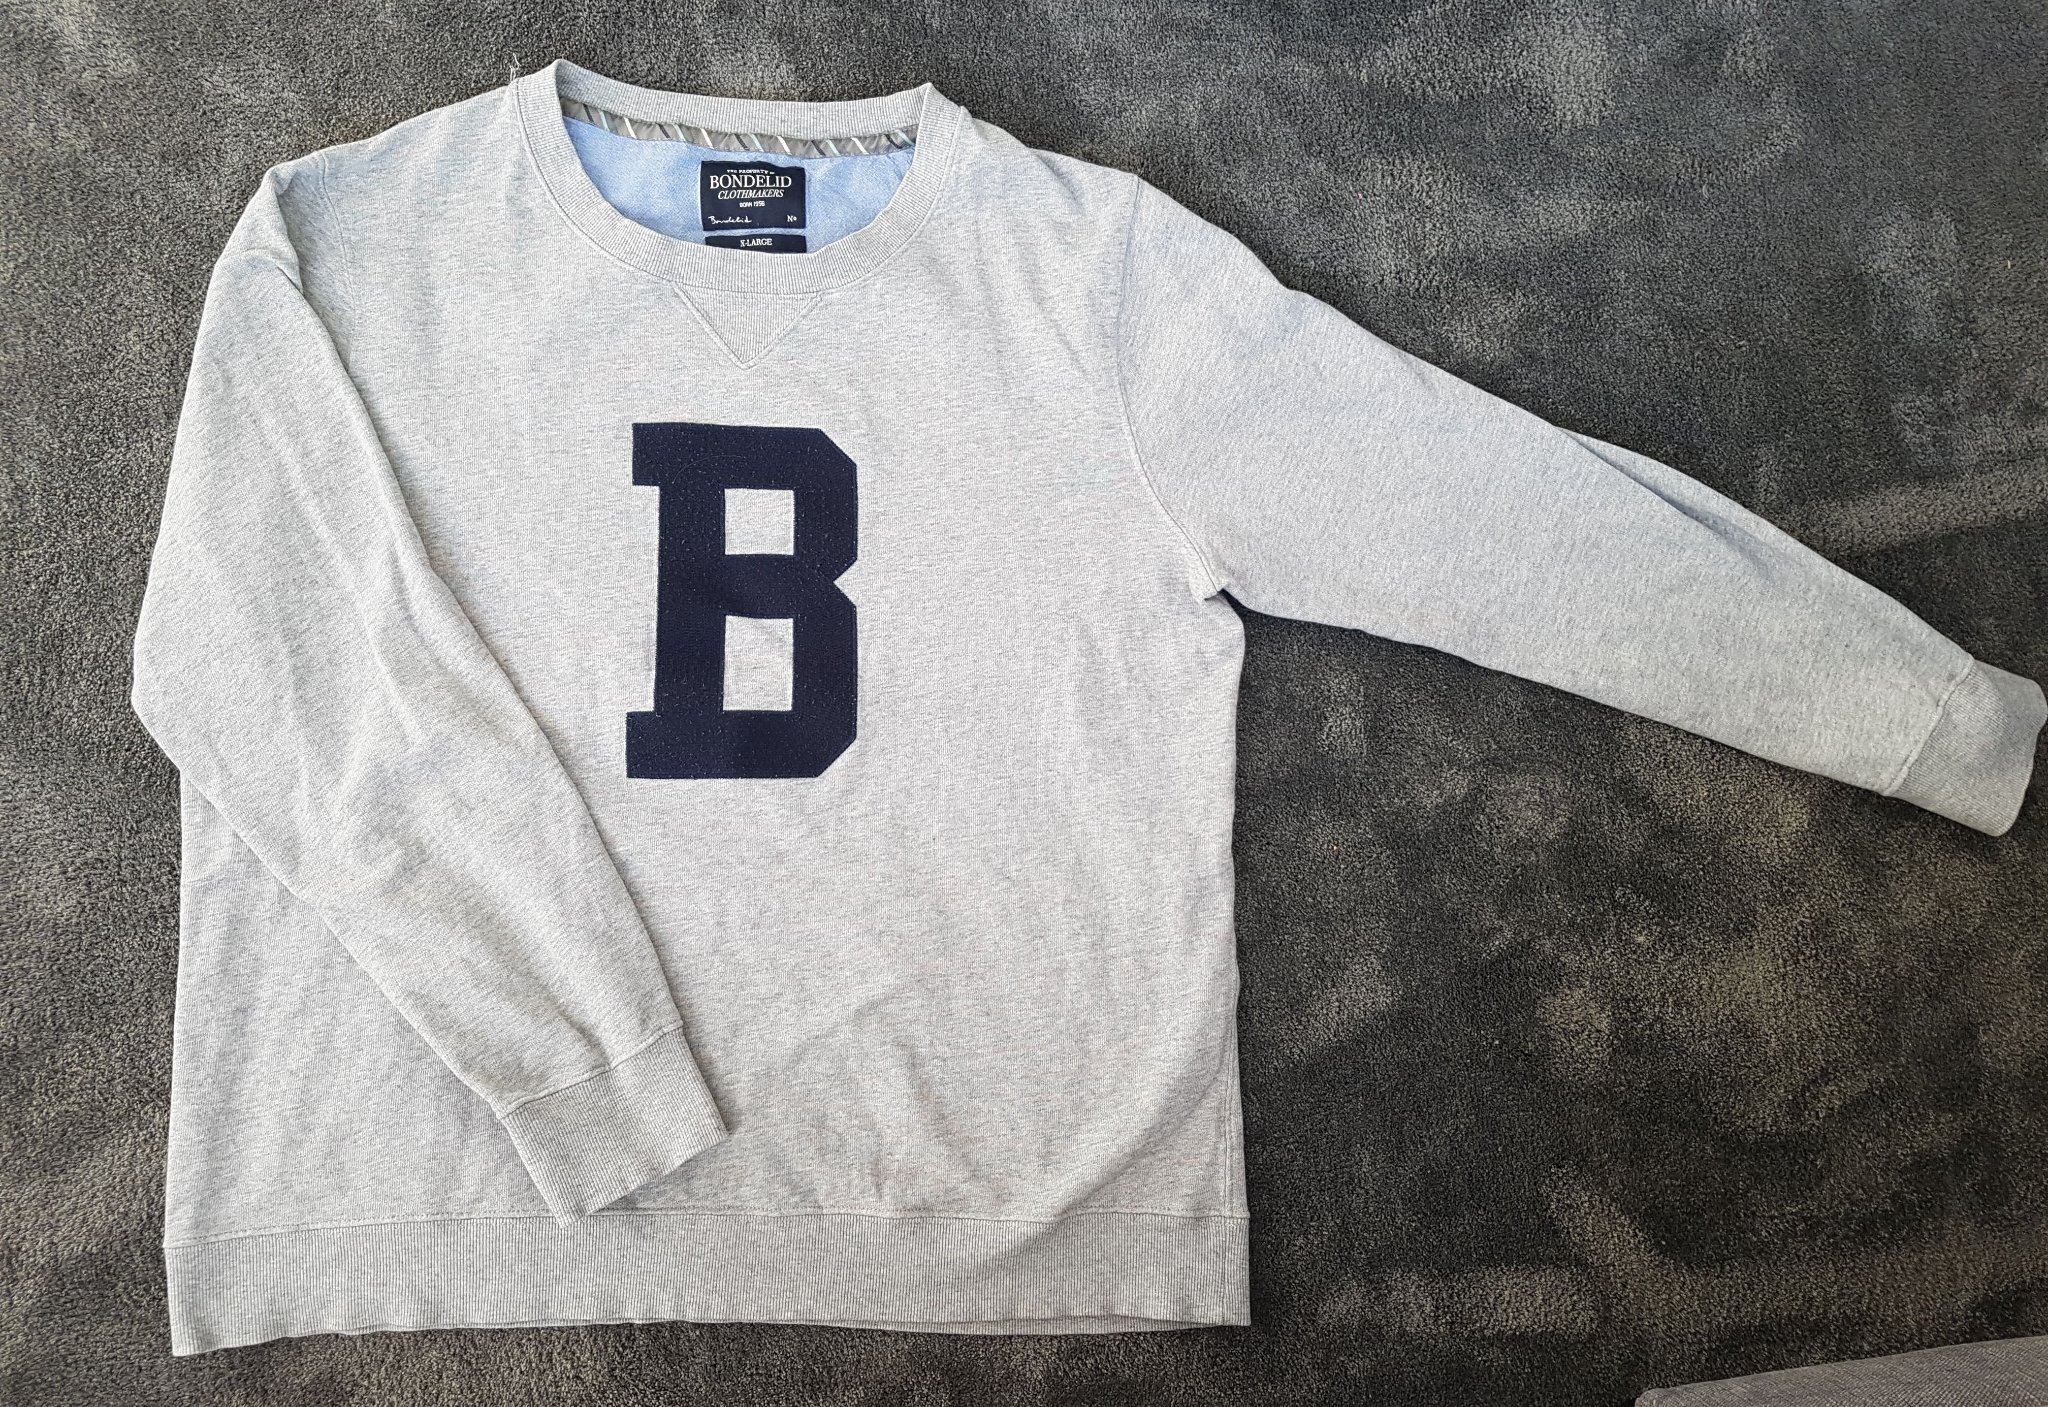 940a481b6c43 Bondelid grå herr tröja xl xlarge (344380140) ᐈ Köp på Tradera